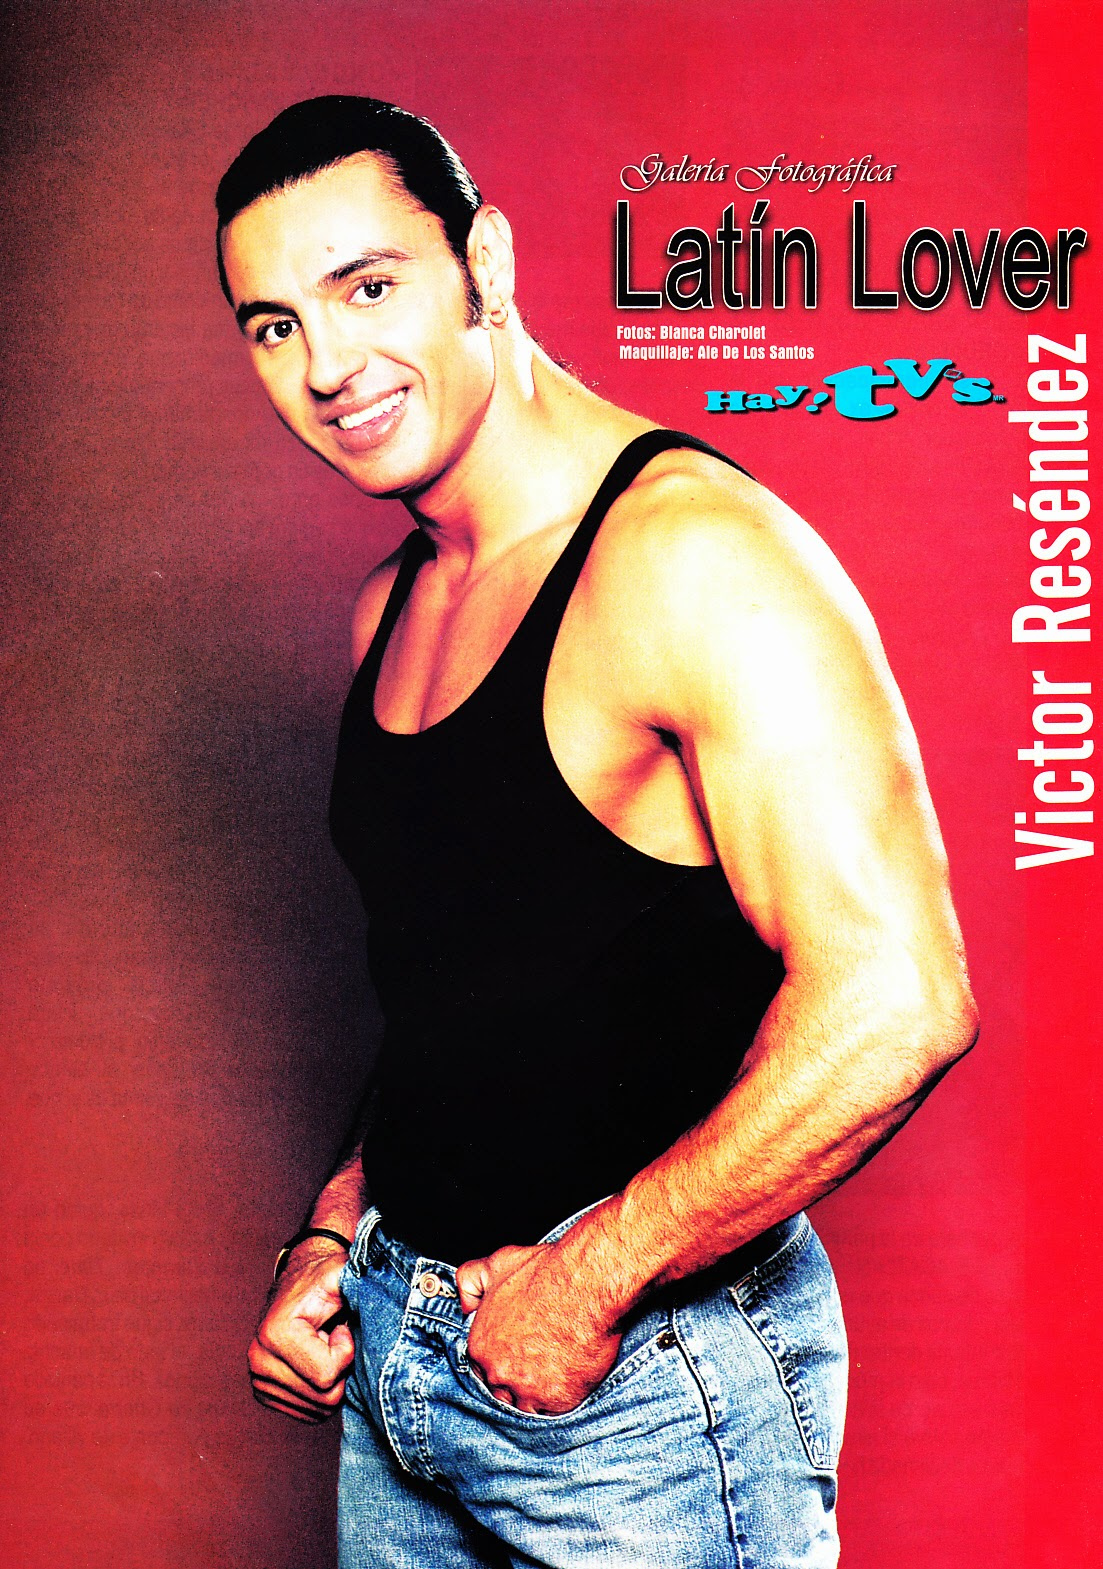 latin lover - photo #8